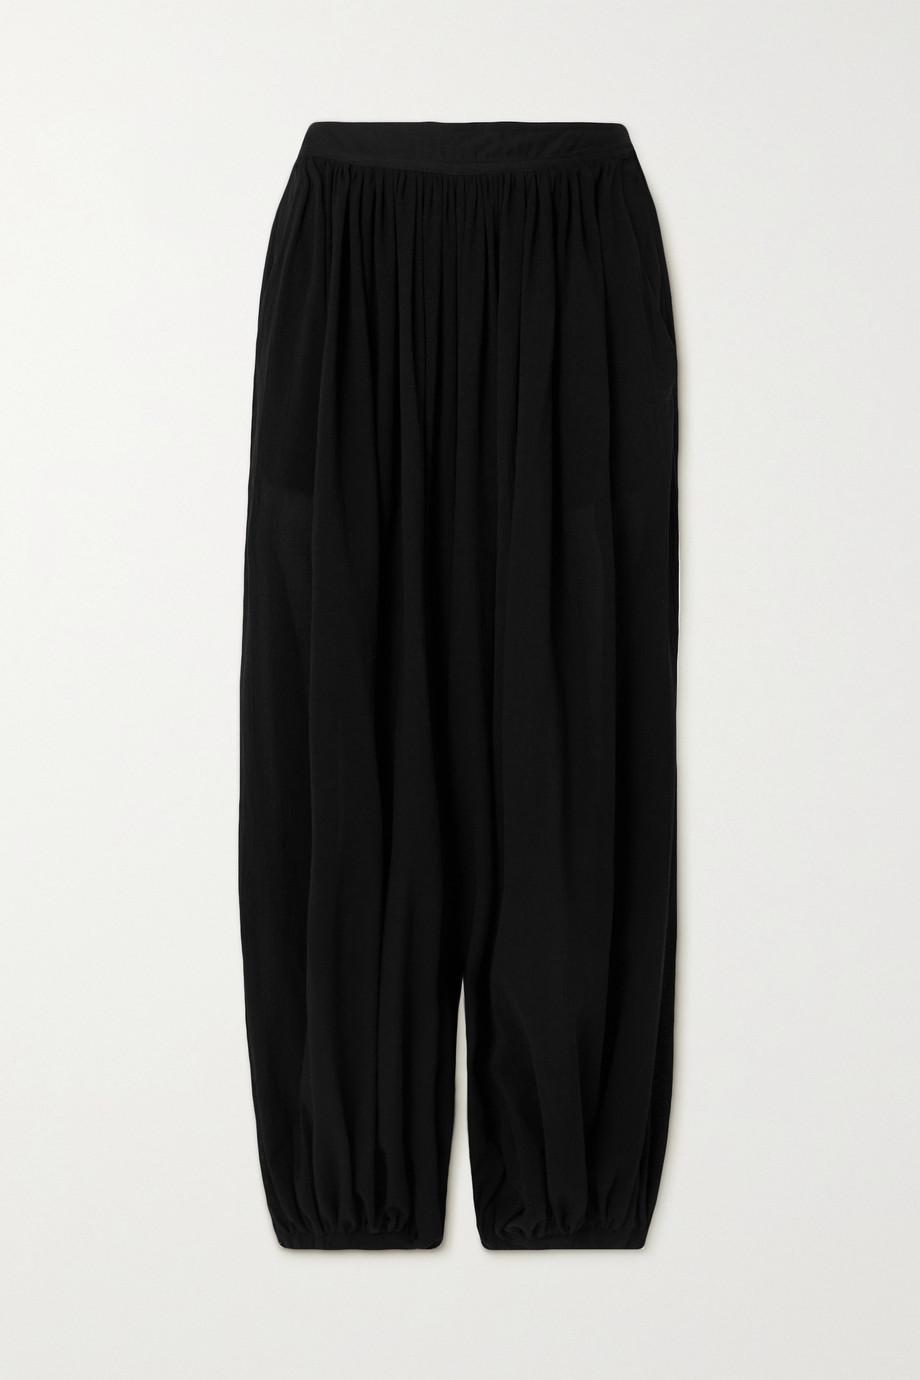 Loewe + Paula's Ibiza draped cotton-voile pants